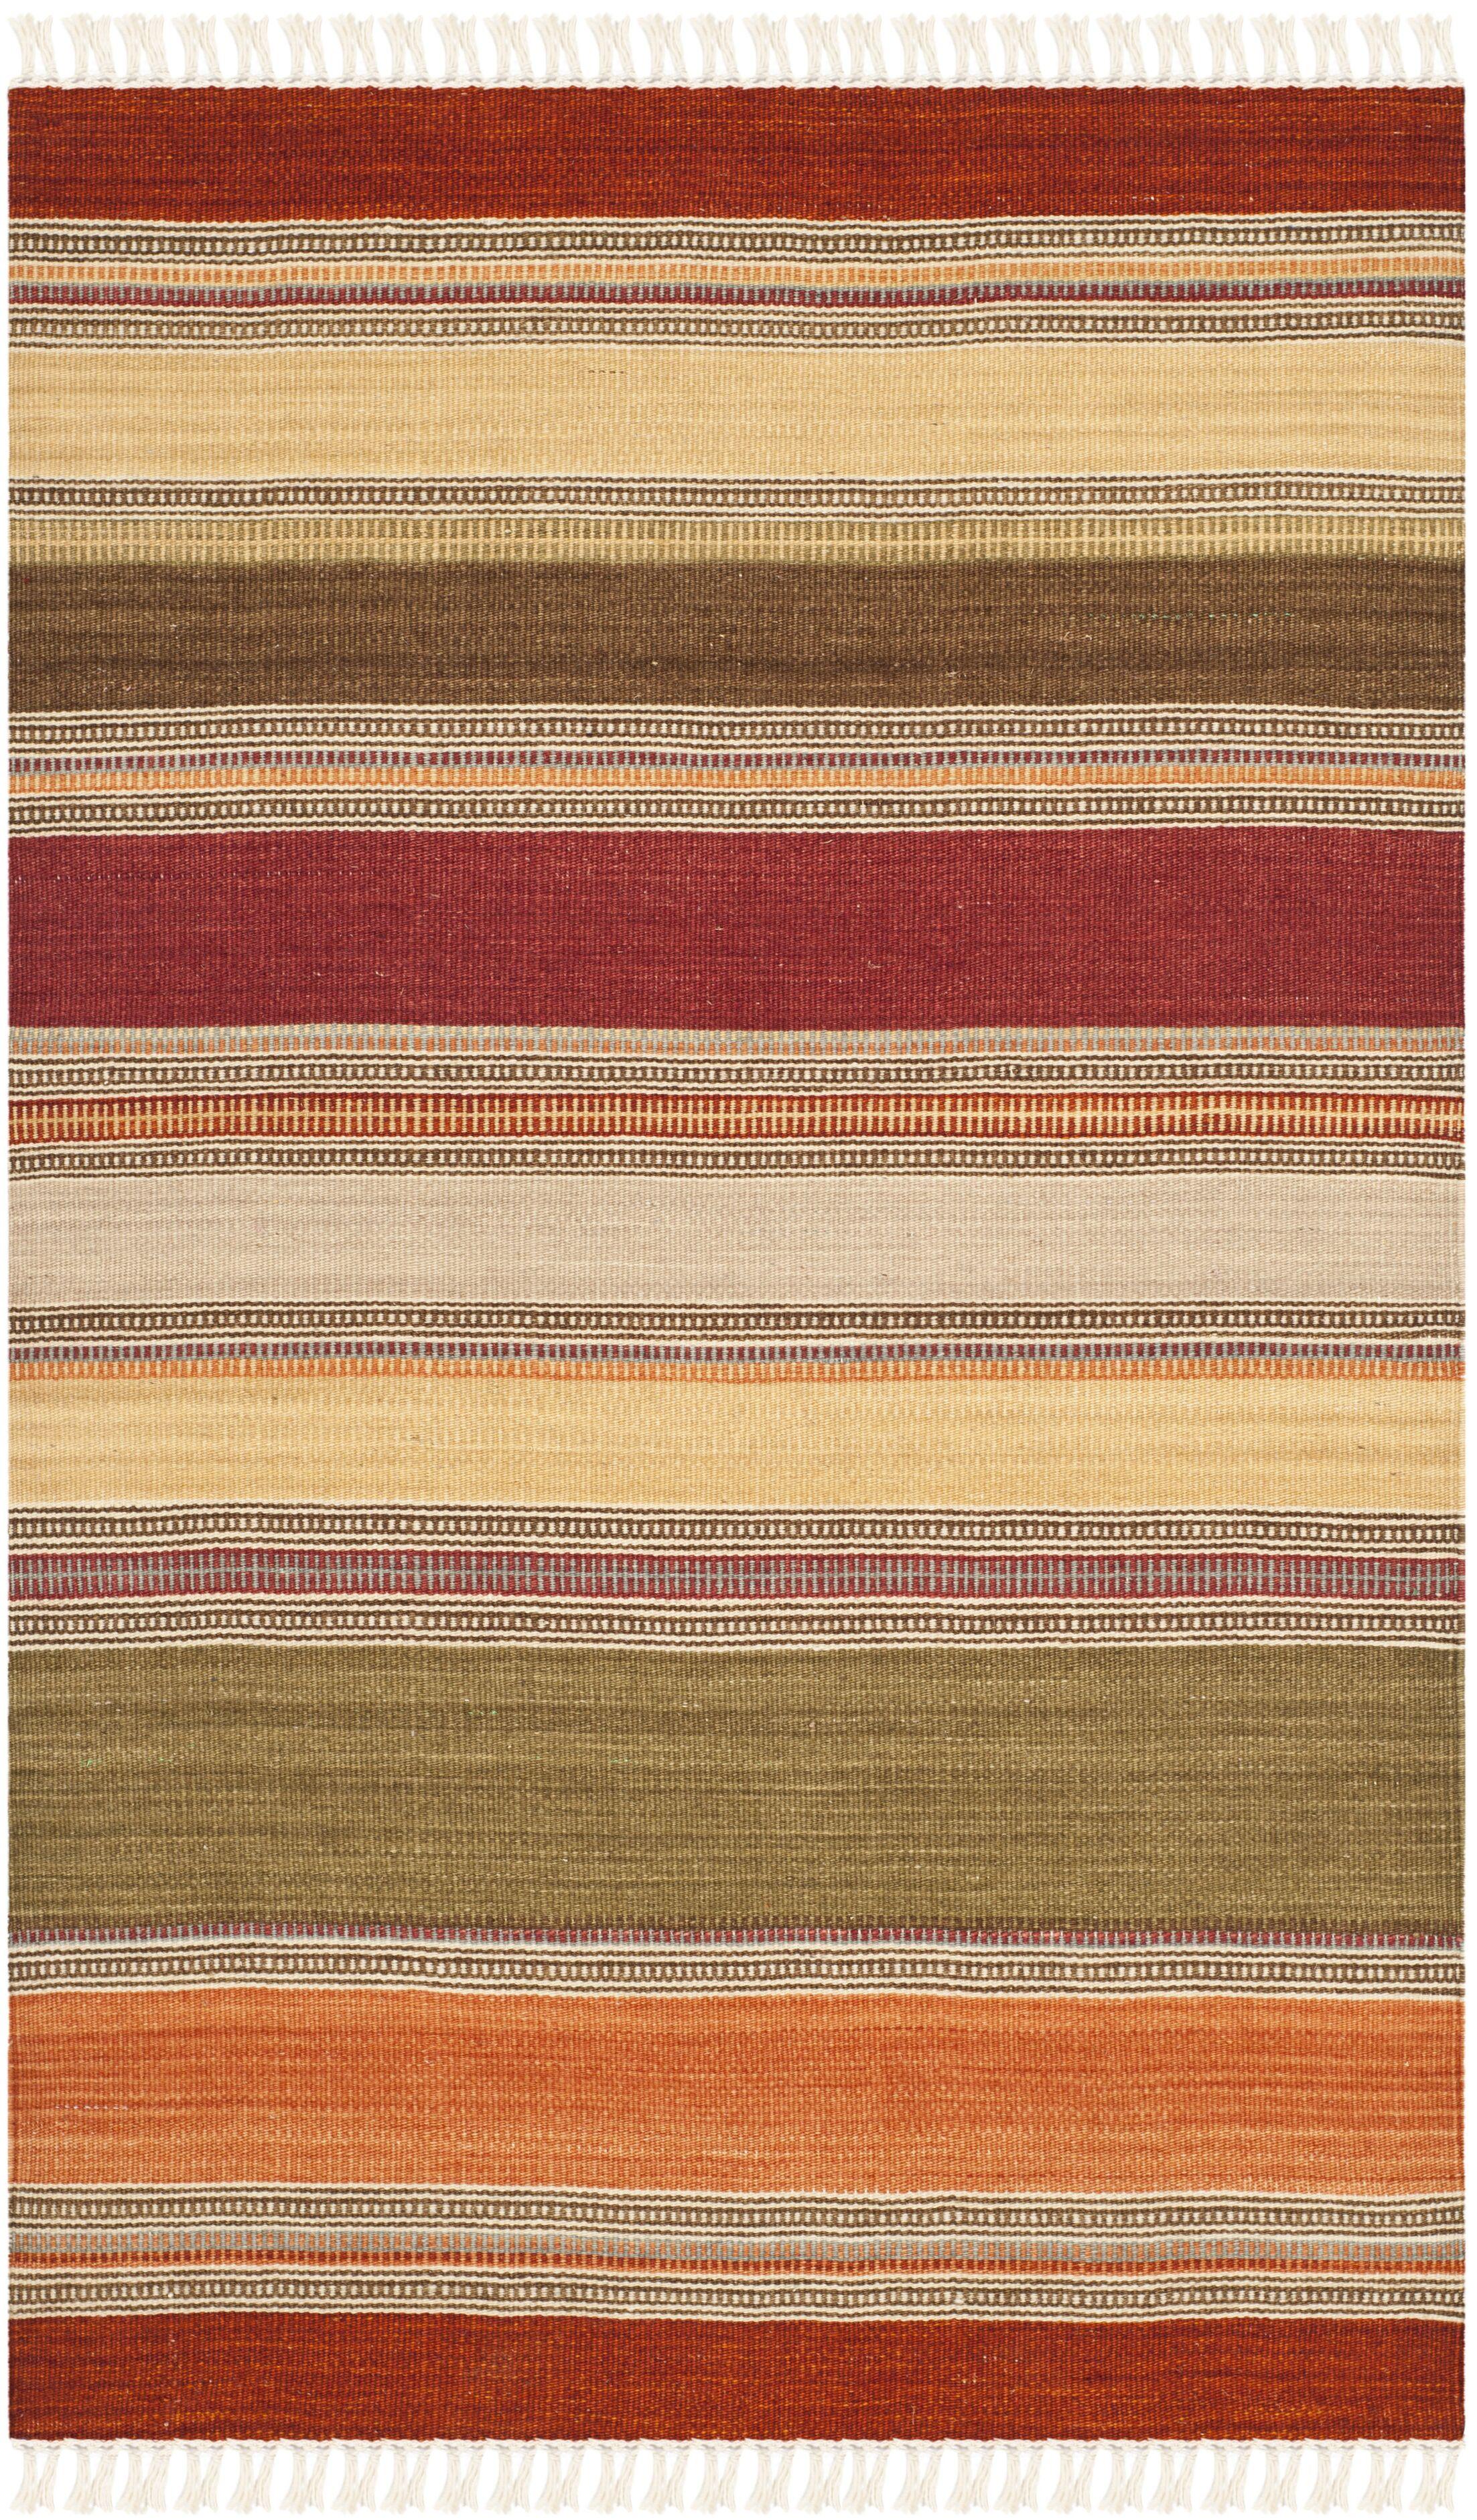 Northeast Pueblo Hand-Woven Area Rug Rug Size: Rectangle 9' x 12'